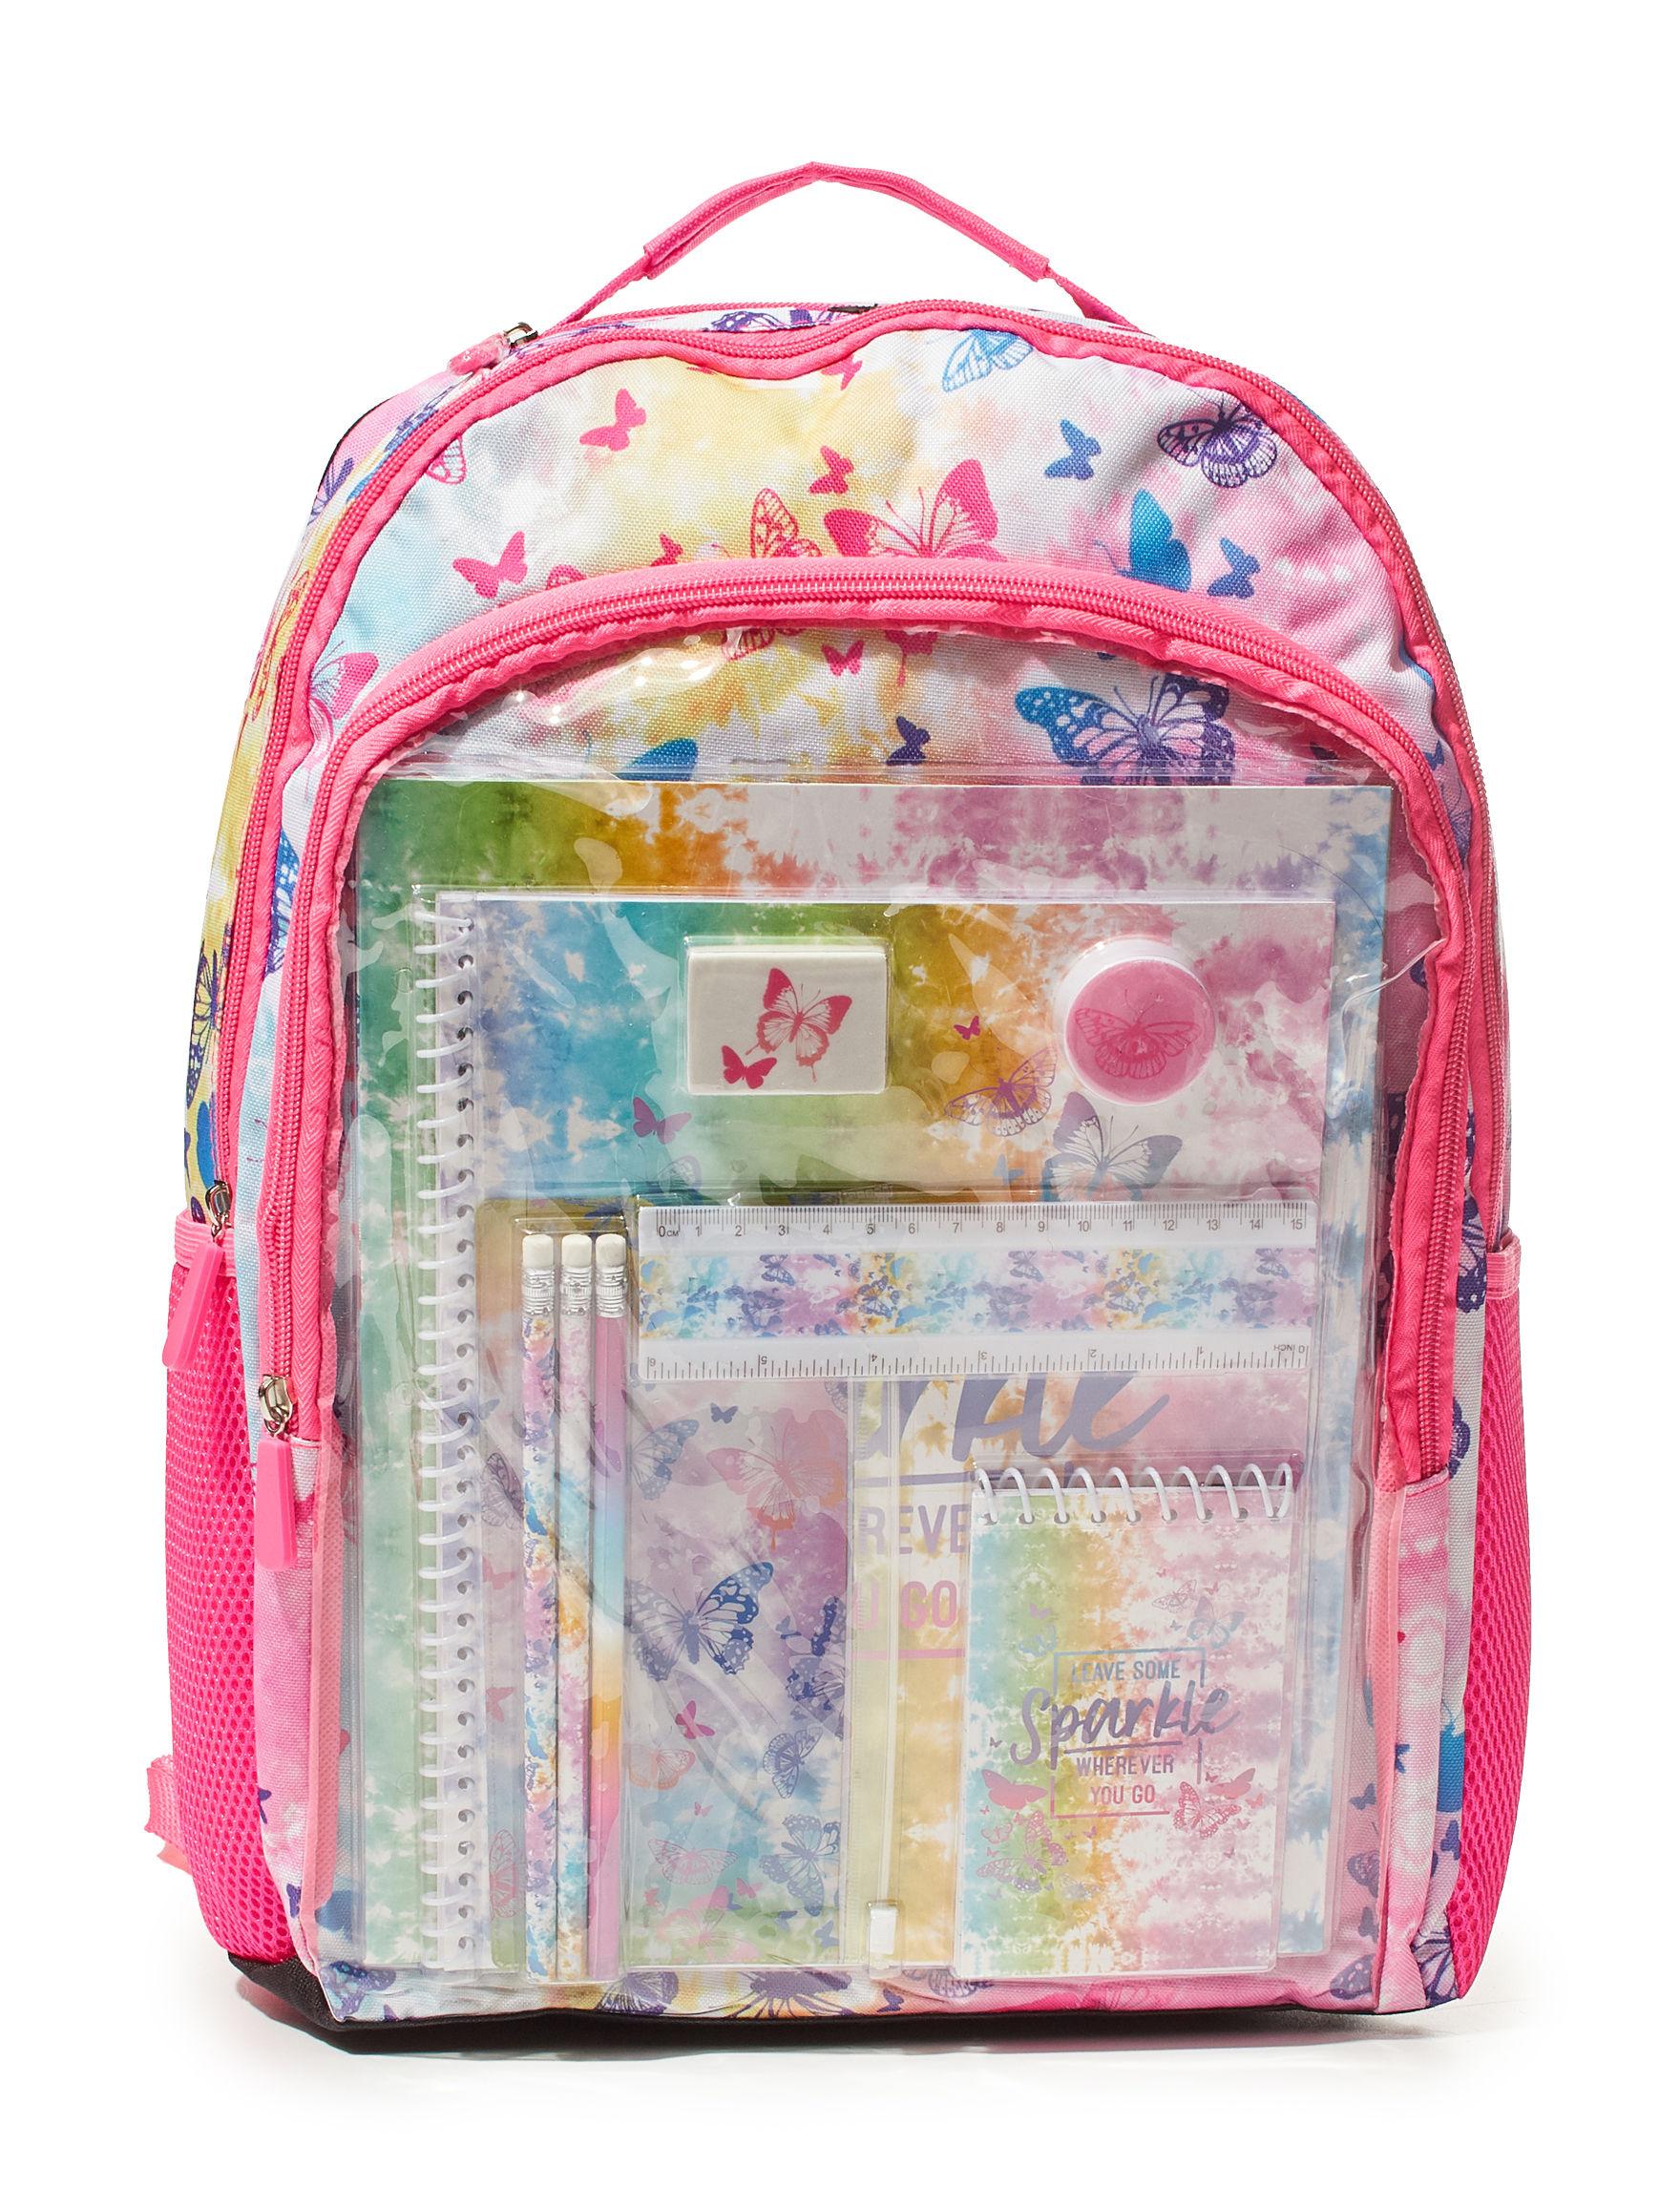 Limited Too Pink Bookbags & Backpacks